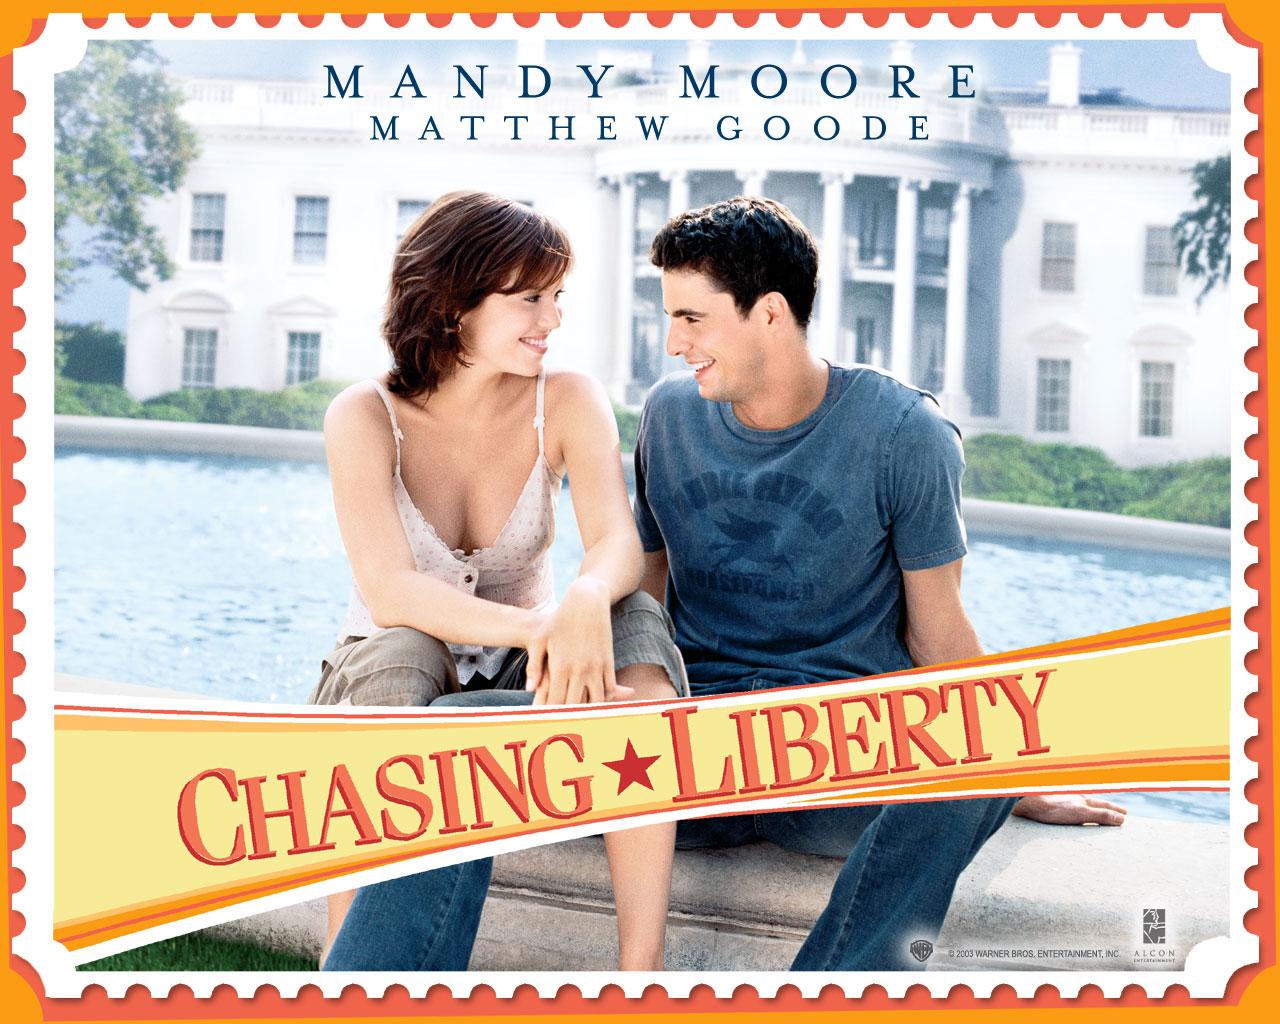 Movies - Chasing Liberty